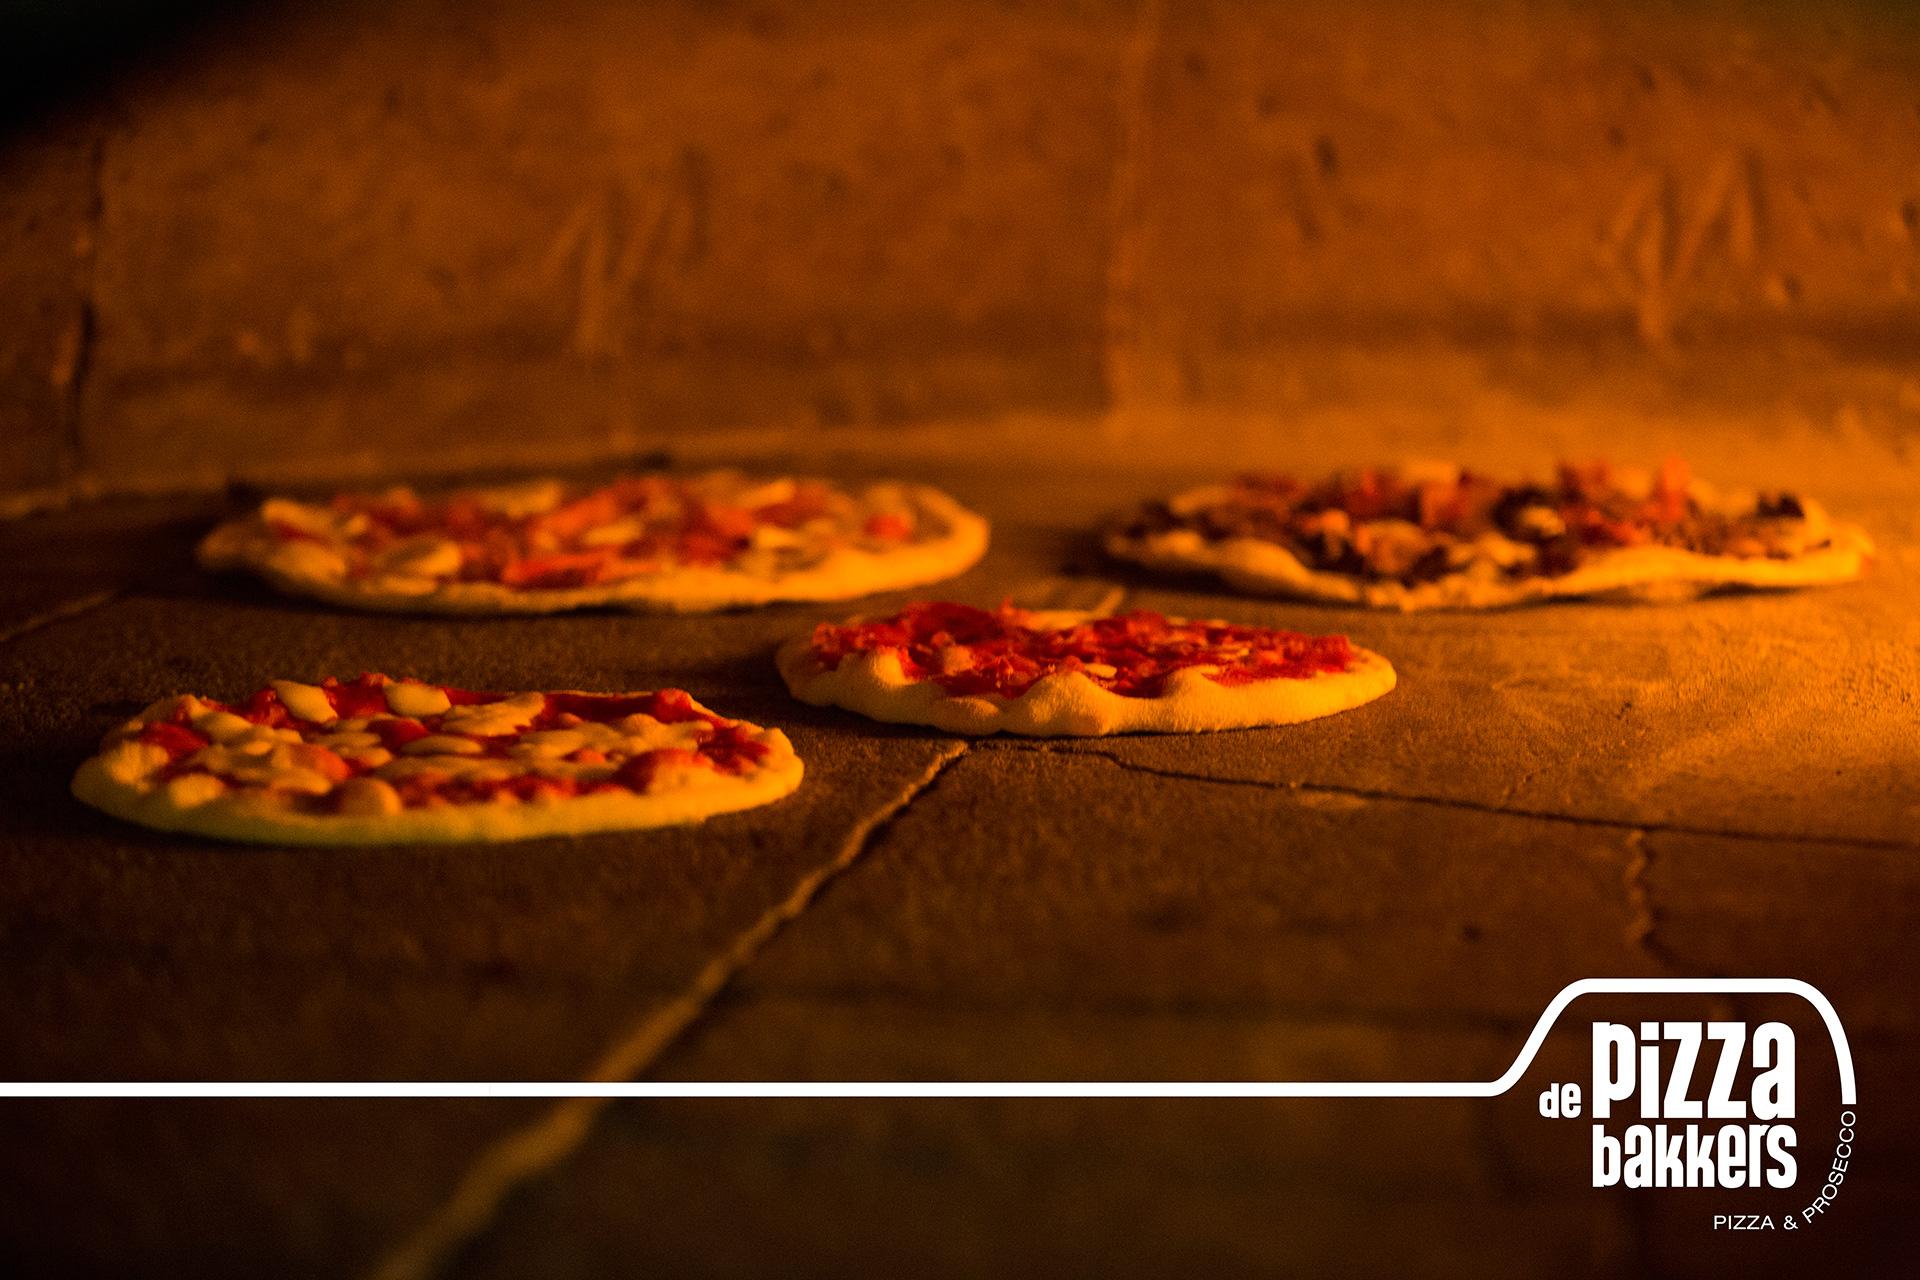 de pizzabakkers delft